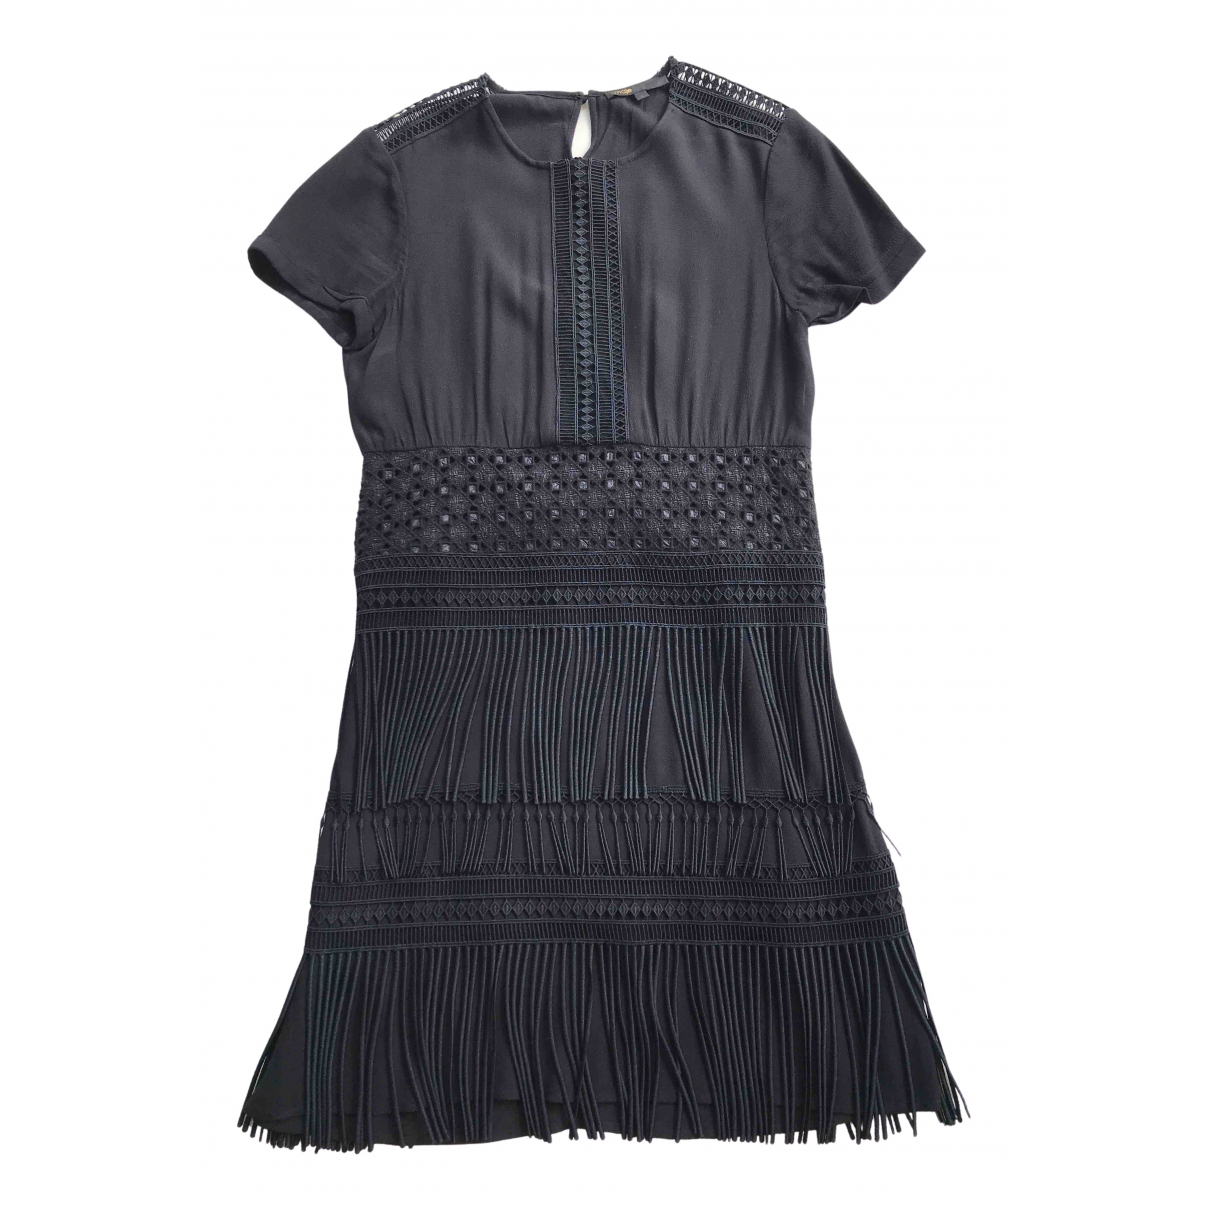 Maje \N Navy dress for Women 1 0-5